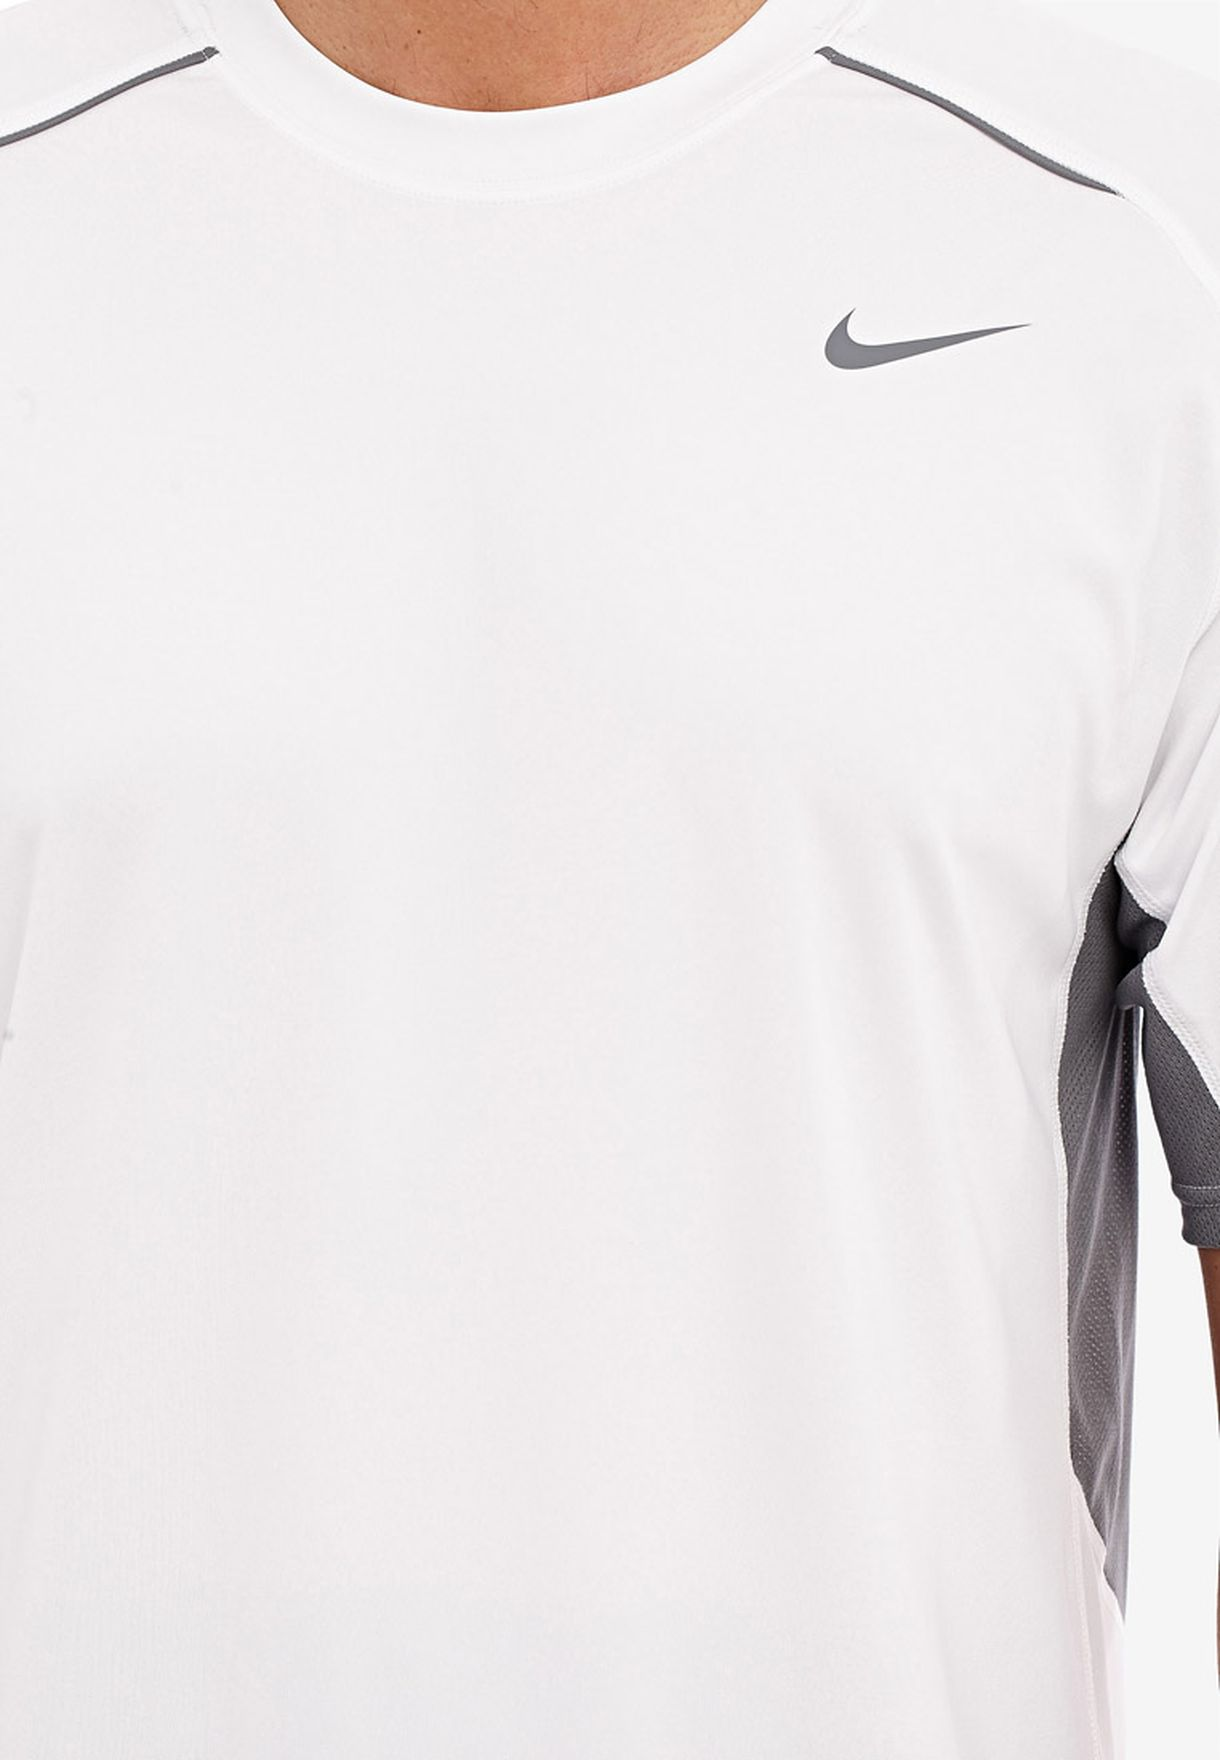 aguja error Subordinar  Buy Nike white Legacy Ss Top for Men in Dubai, Abu Dhabi   519539-100